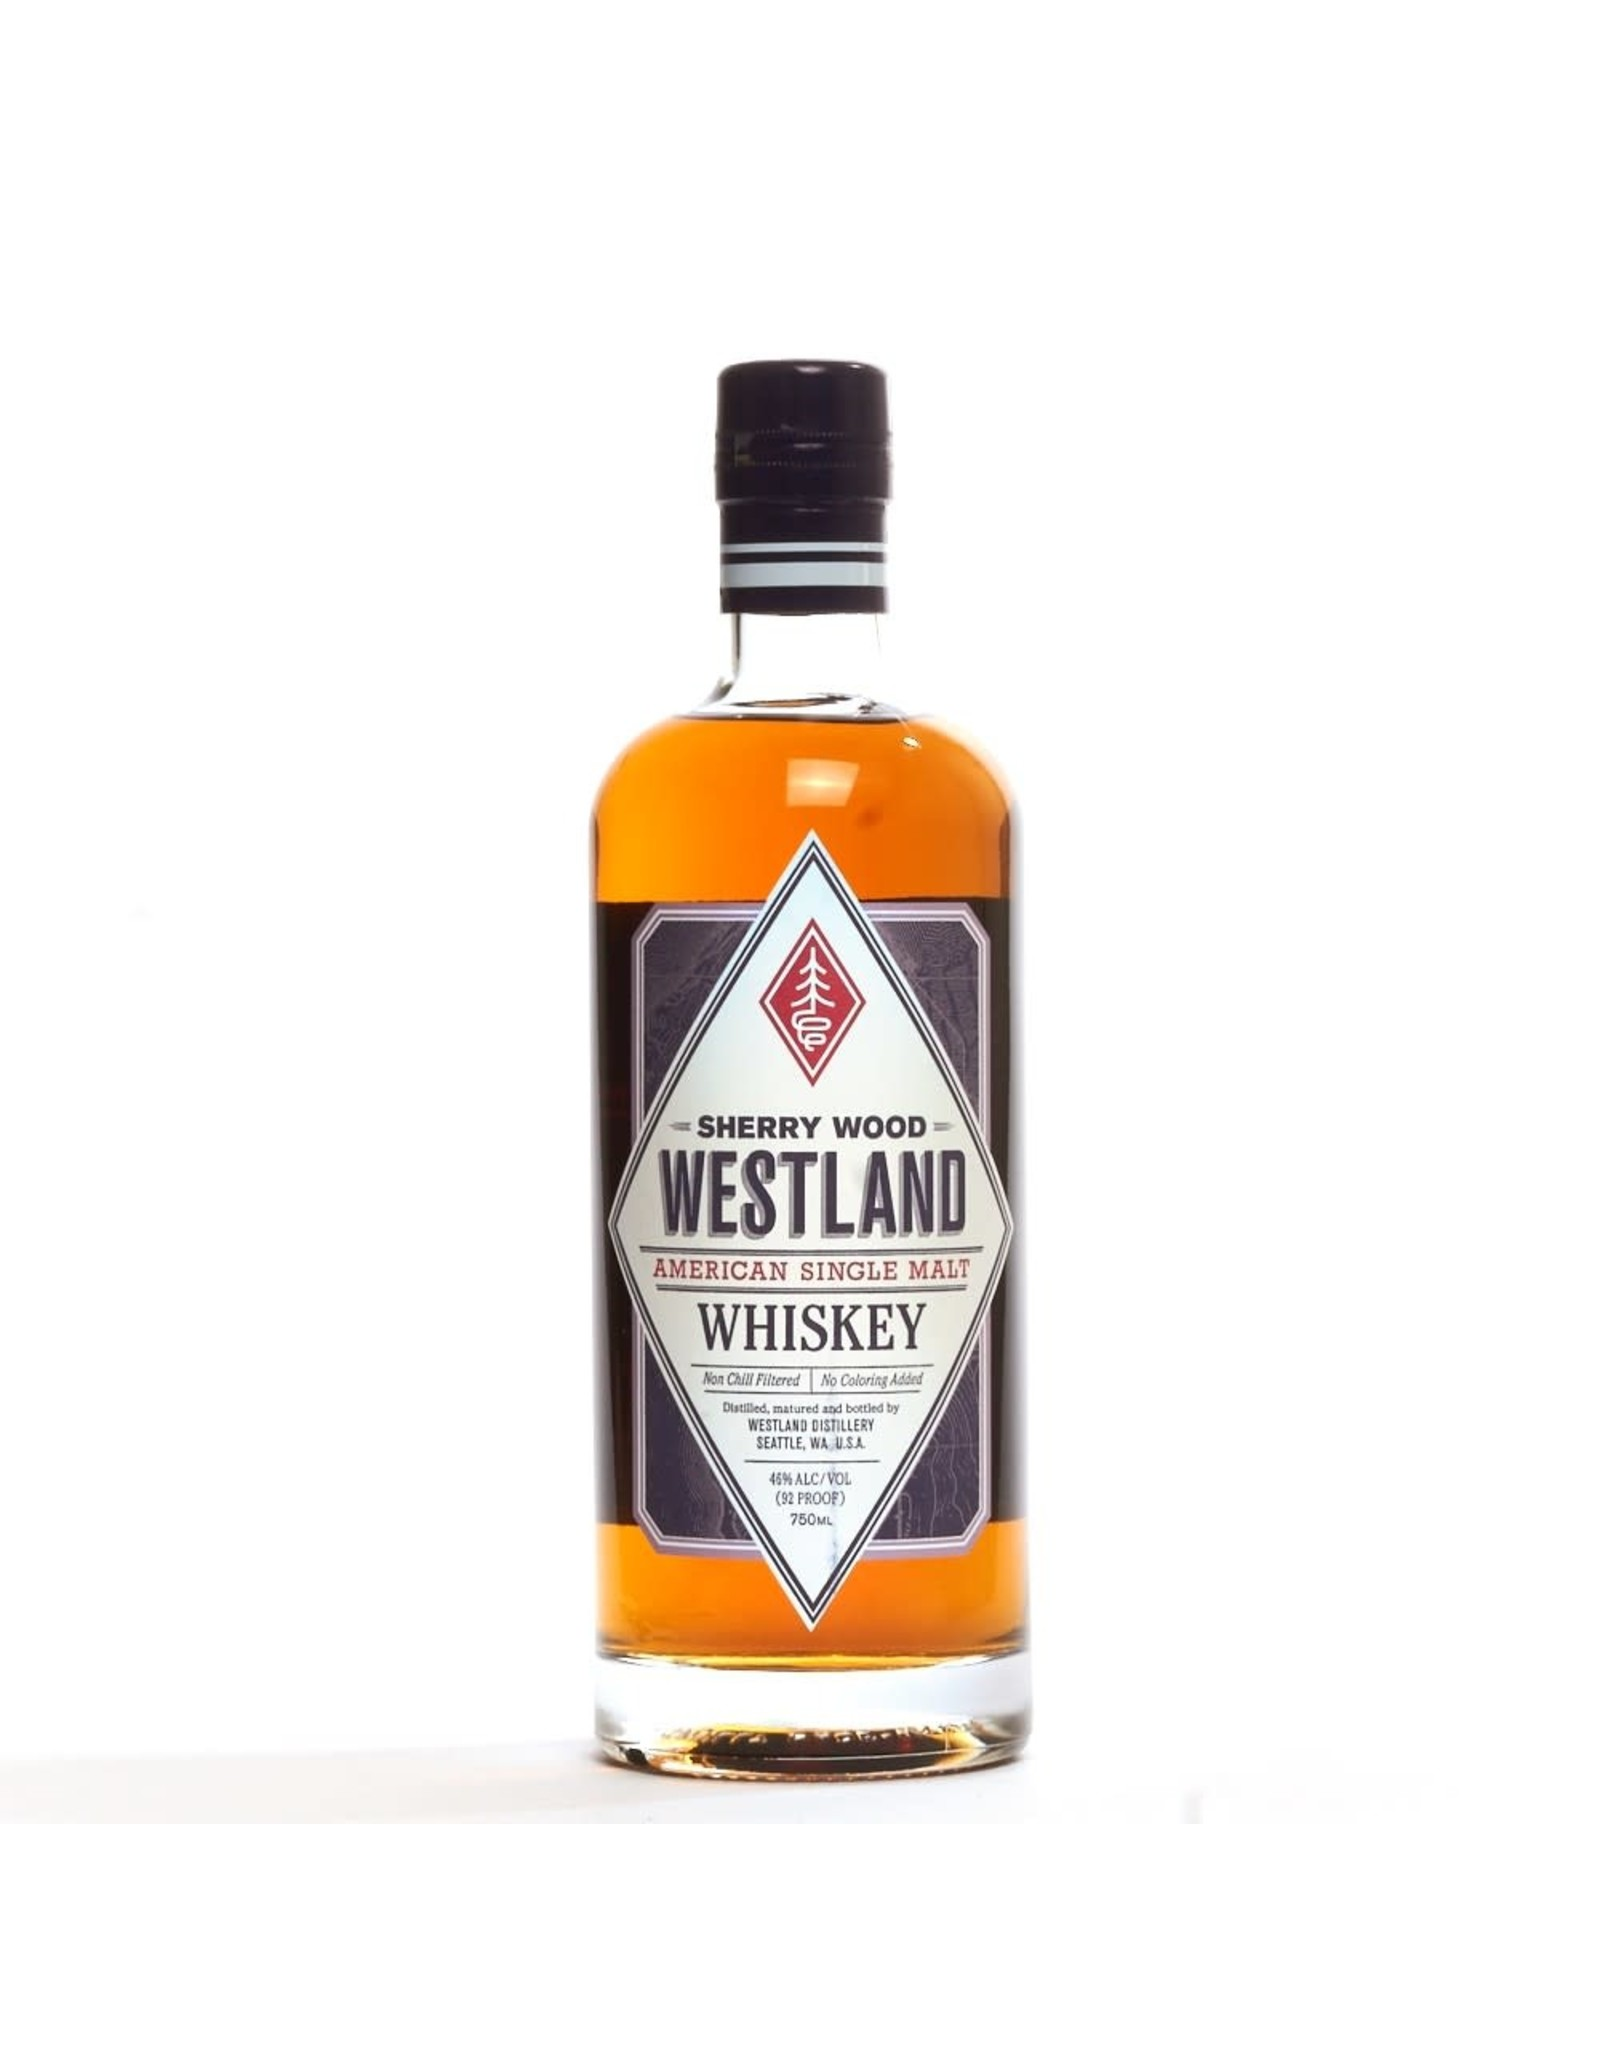 Westland Sherry